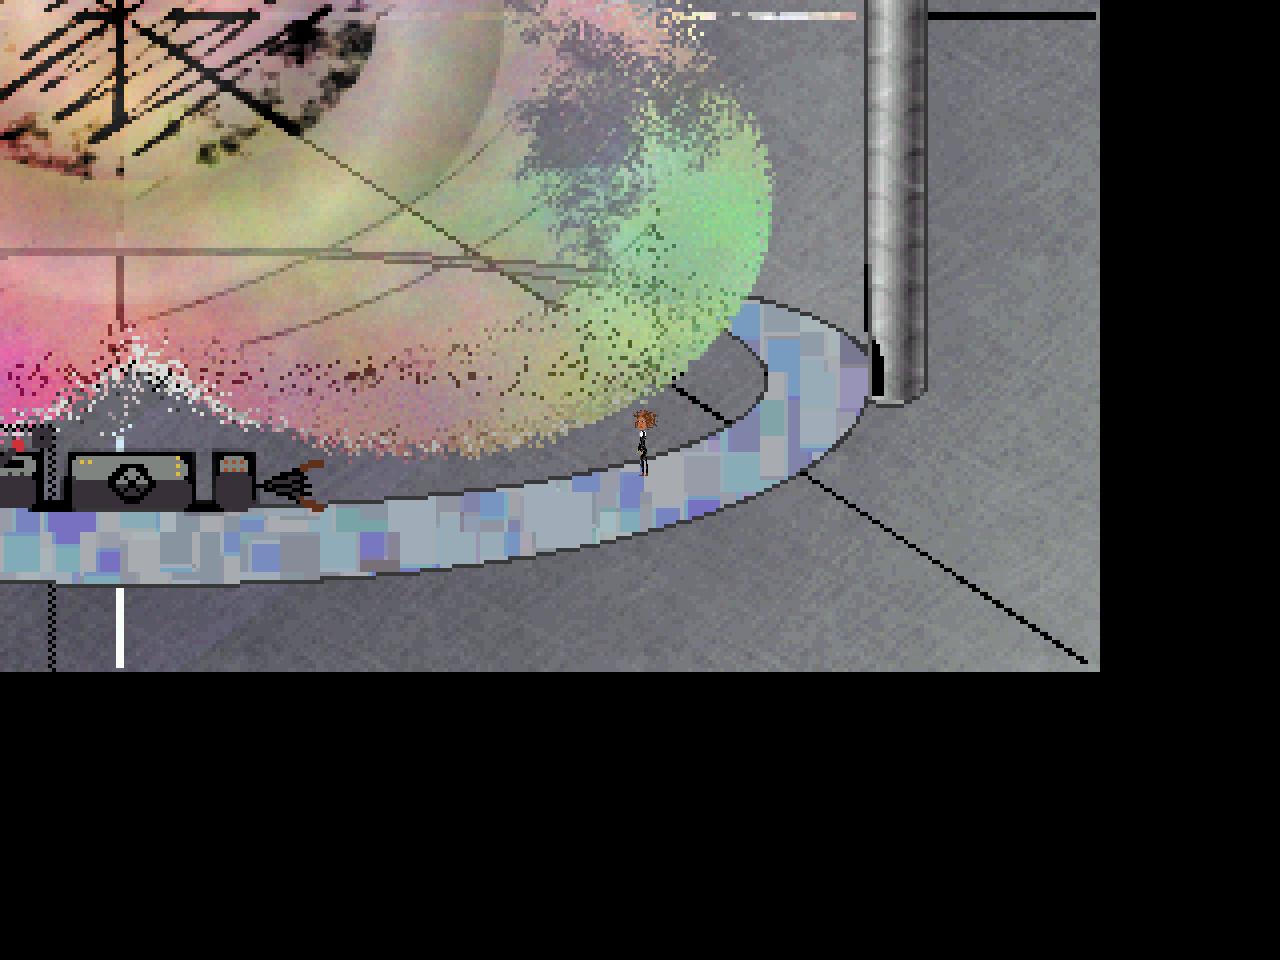 Screenshot 3 of Interstellar Borders width=